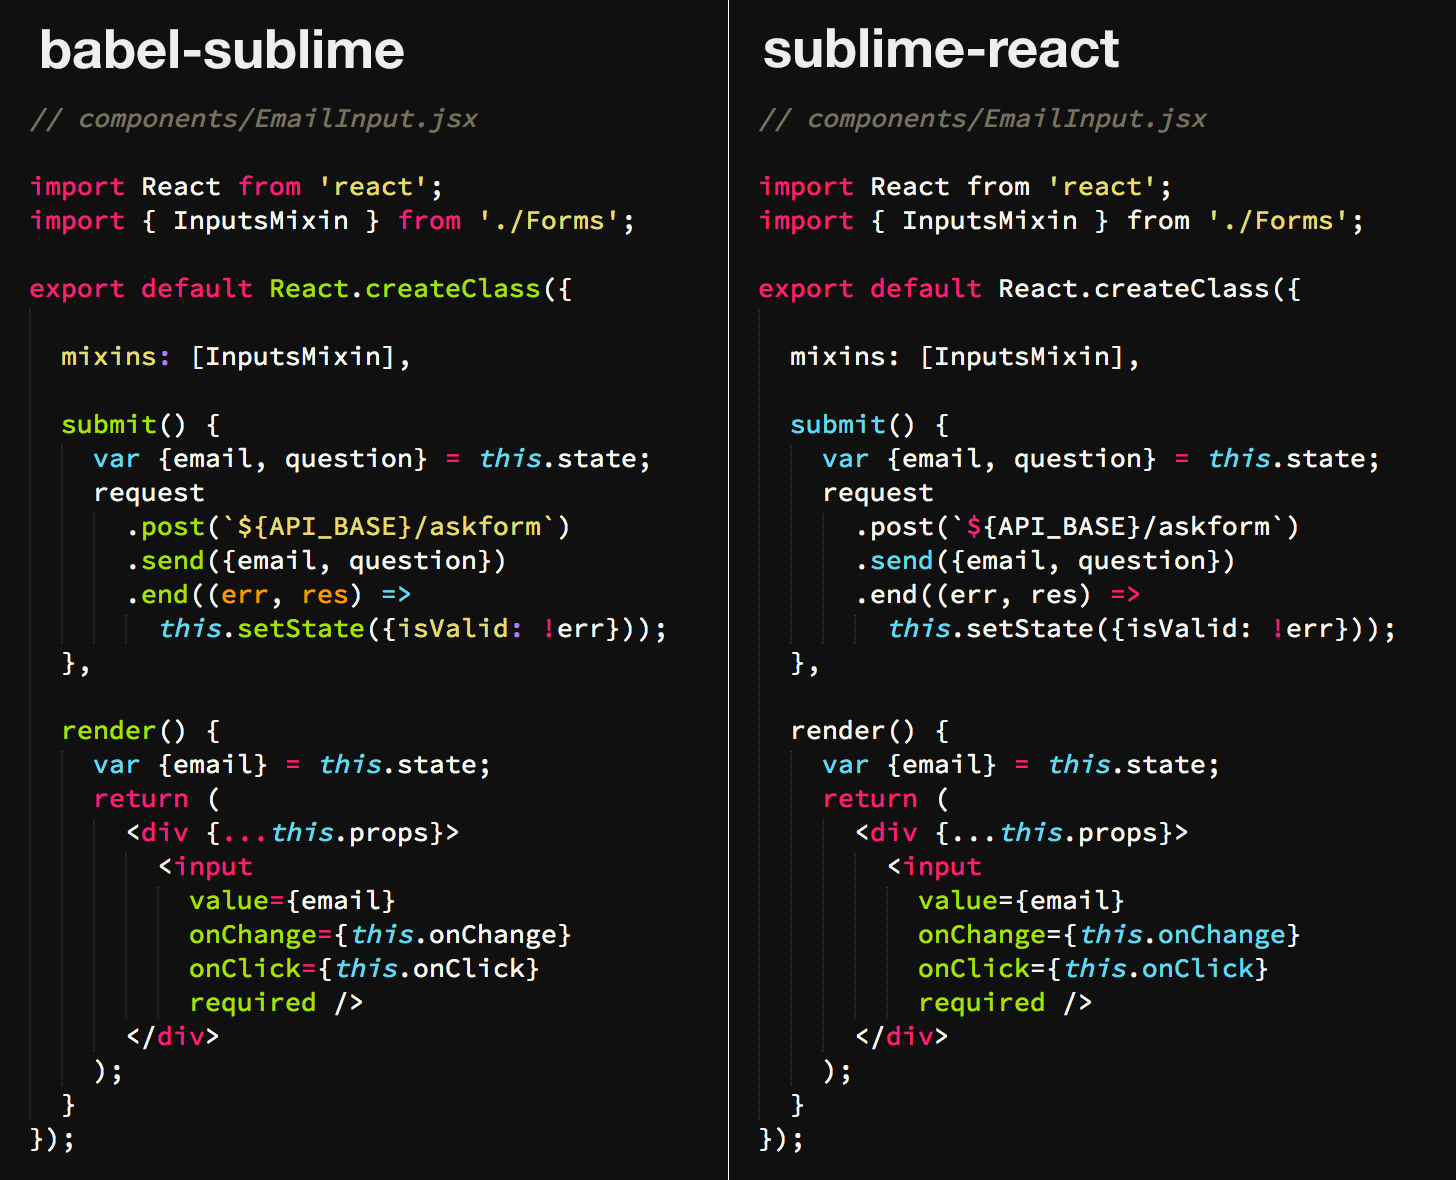 babel-sublime-vs-sublime-react--react-class